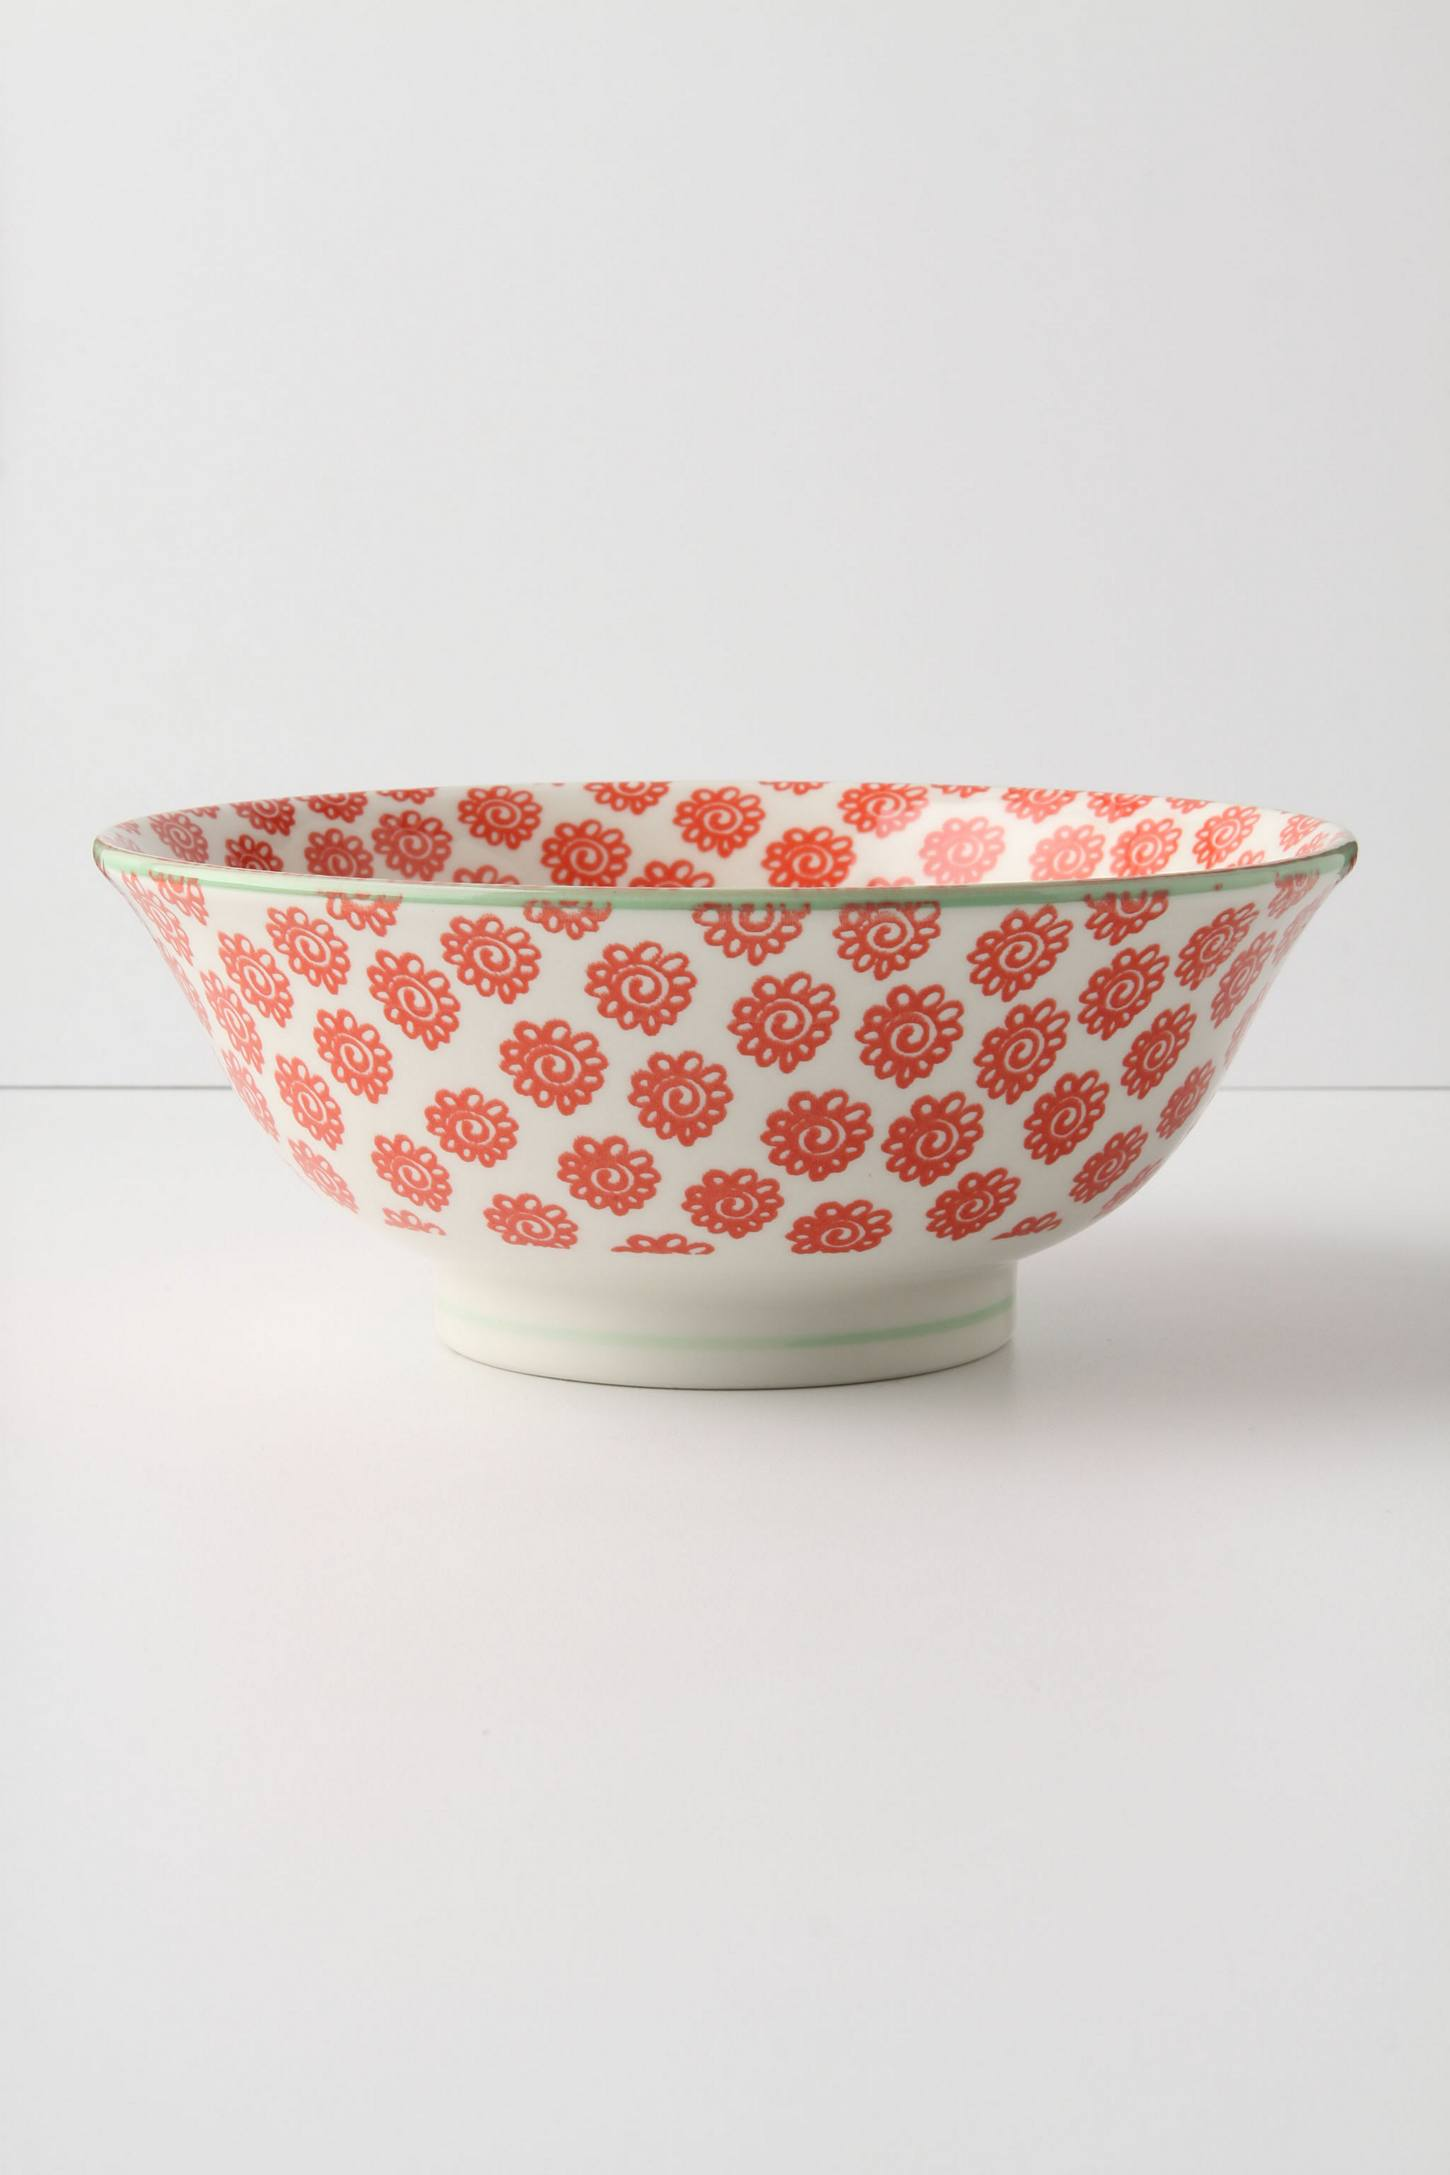 Atom Art Serving Bowl, Red